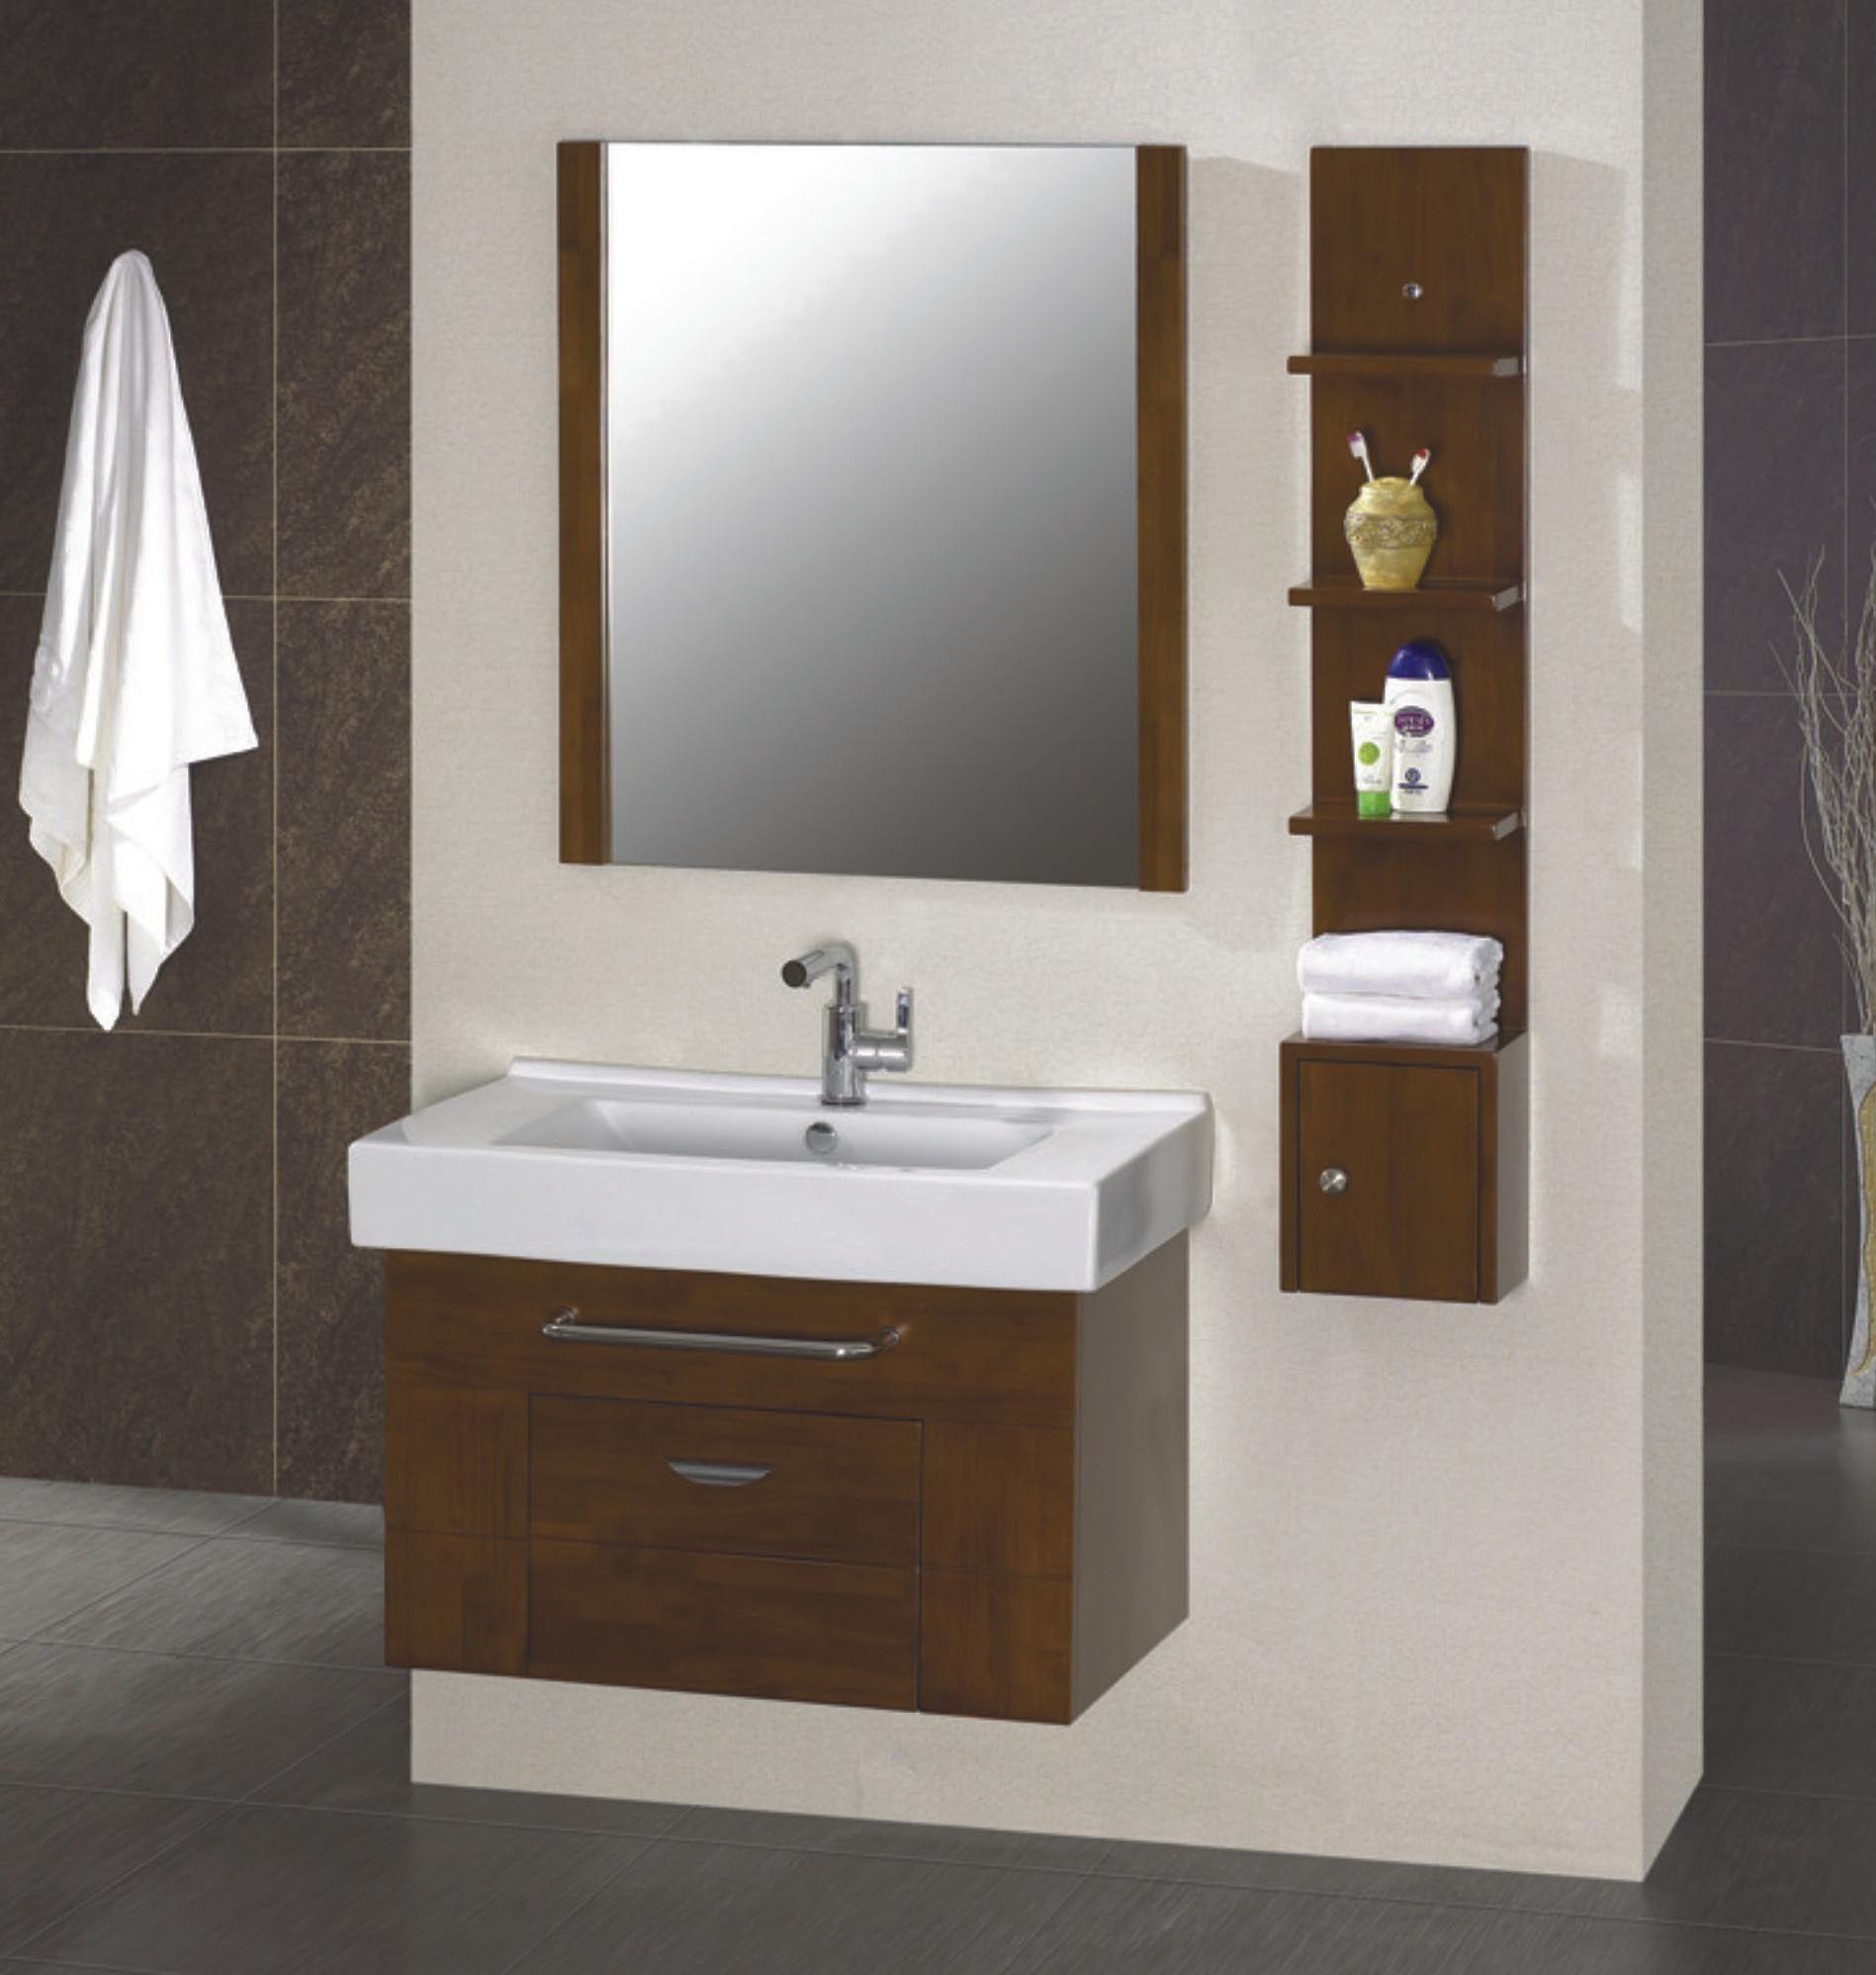 Badezimmer Akzent Mobel Moderne Badezimmerspiegel Badezimmer Gunstig Bad Wand